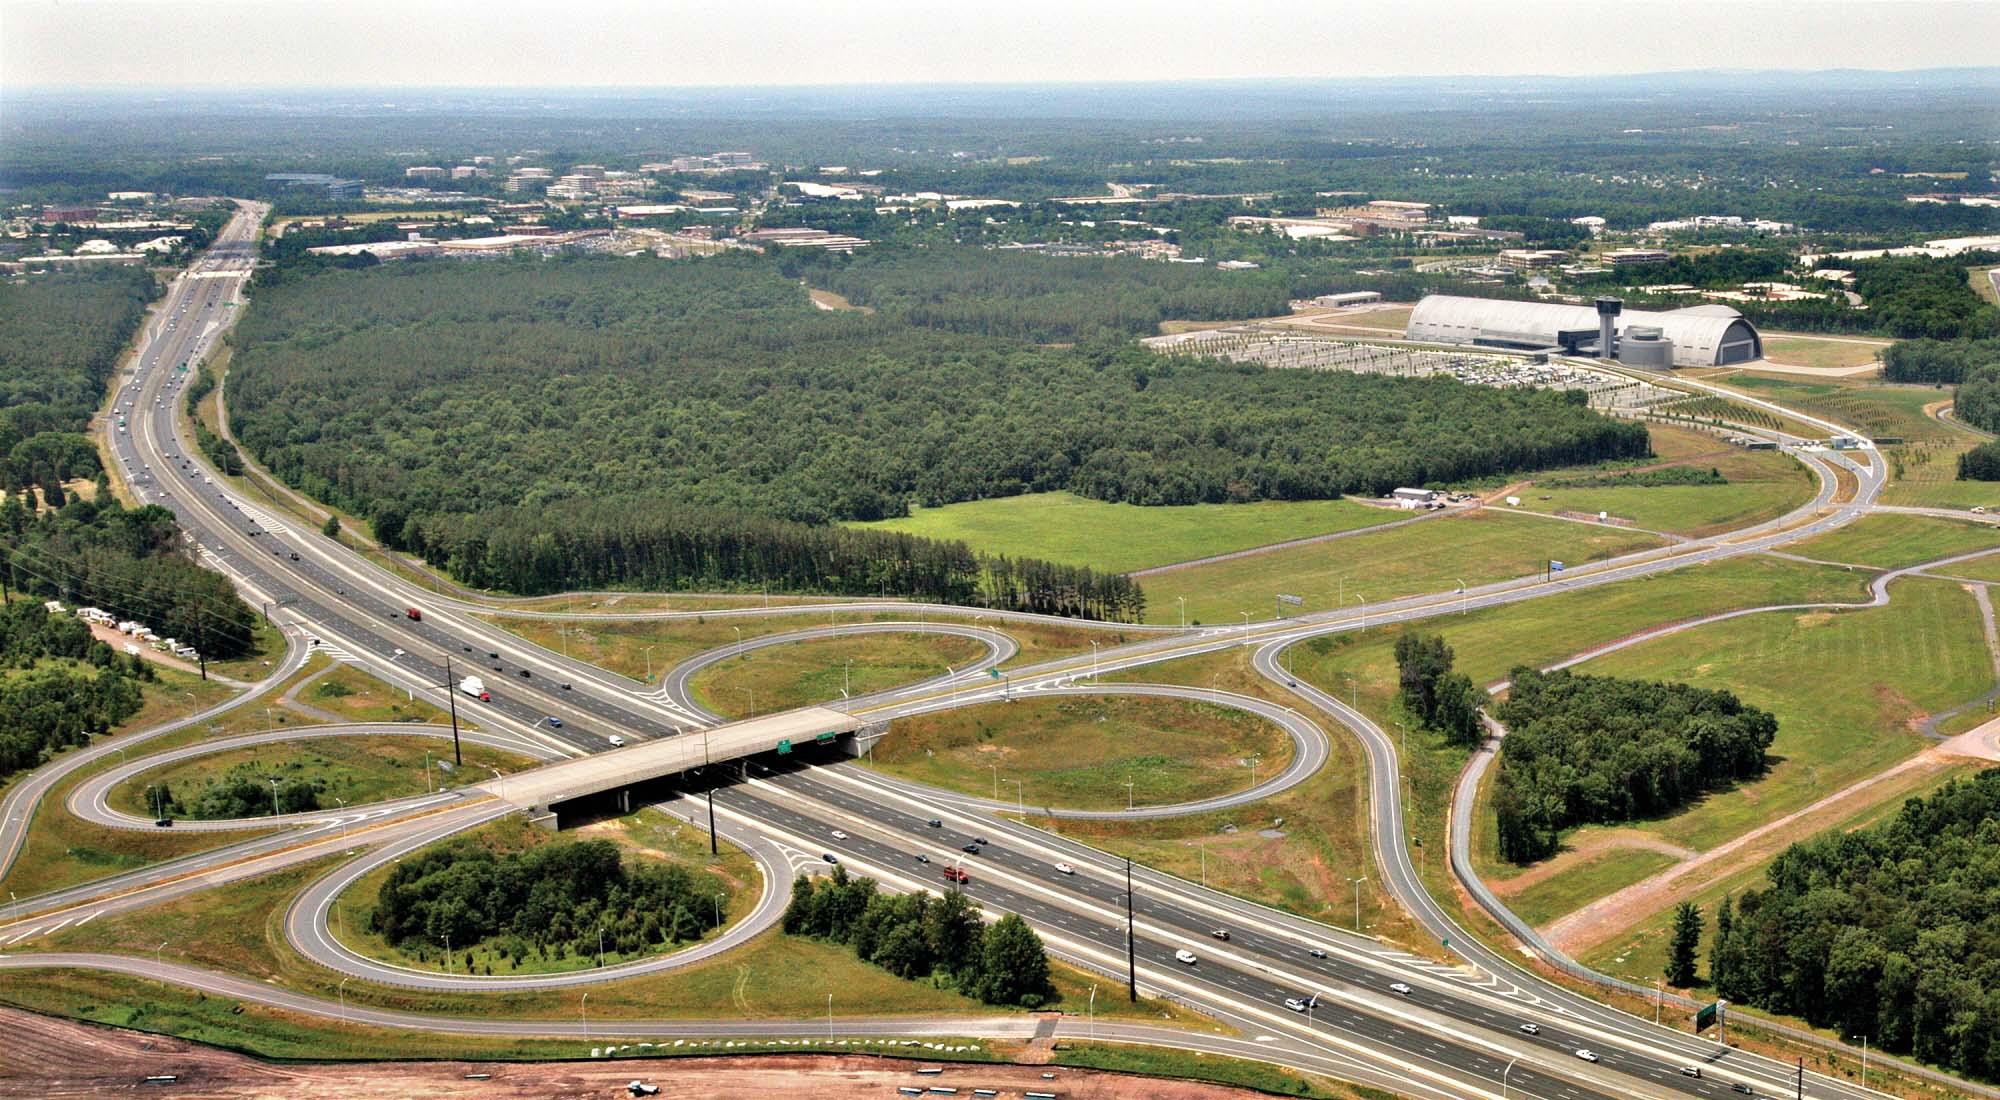 Route 28 Corridor Improvements